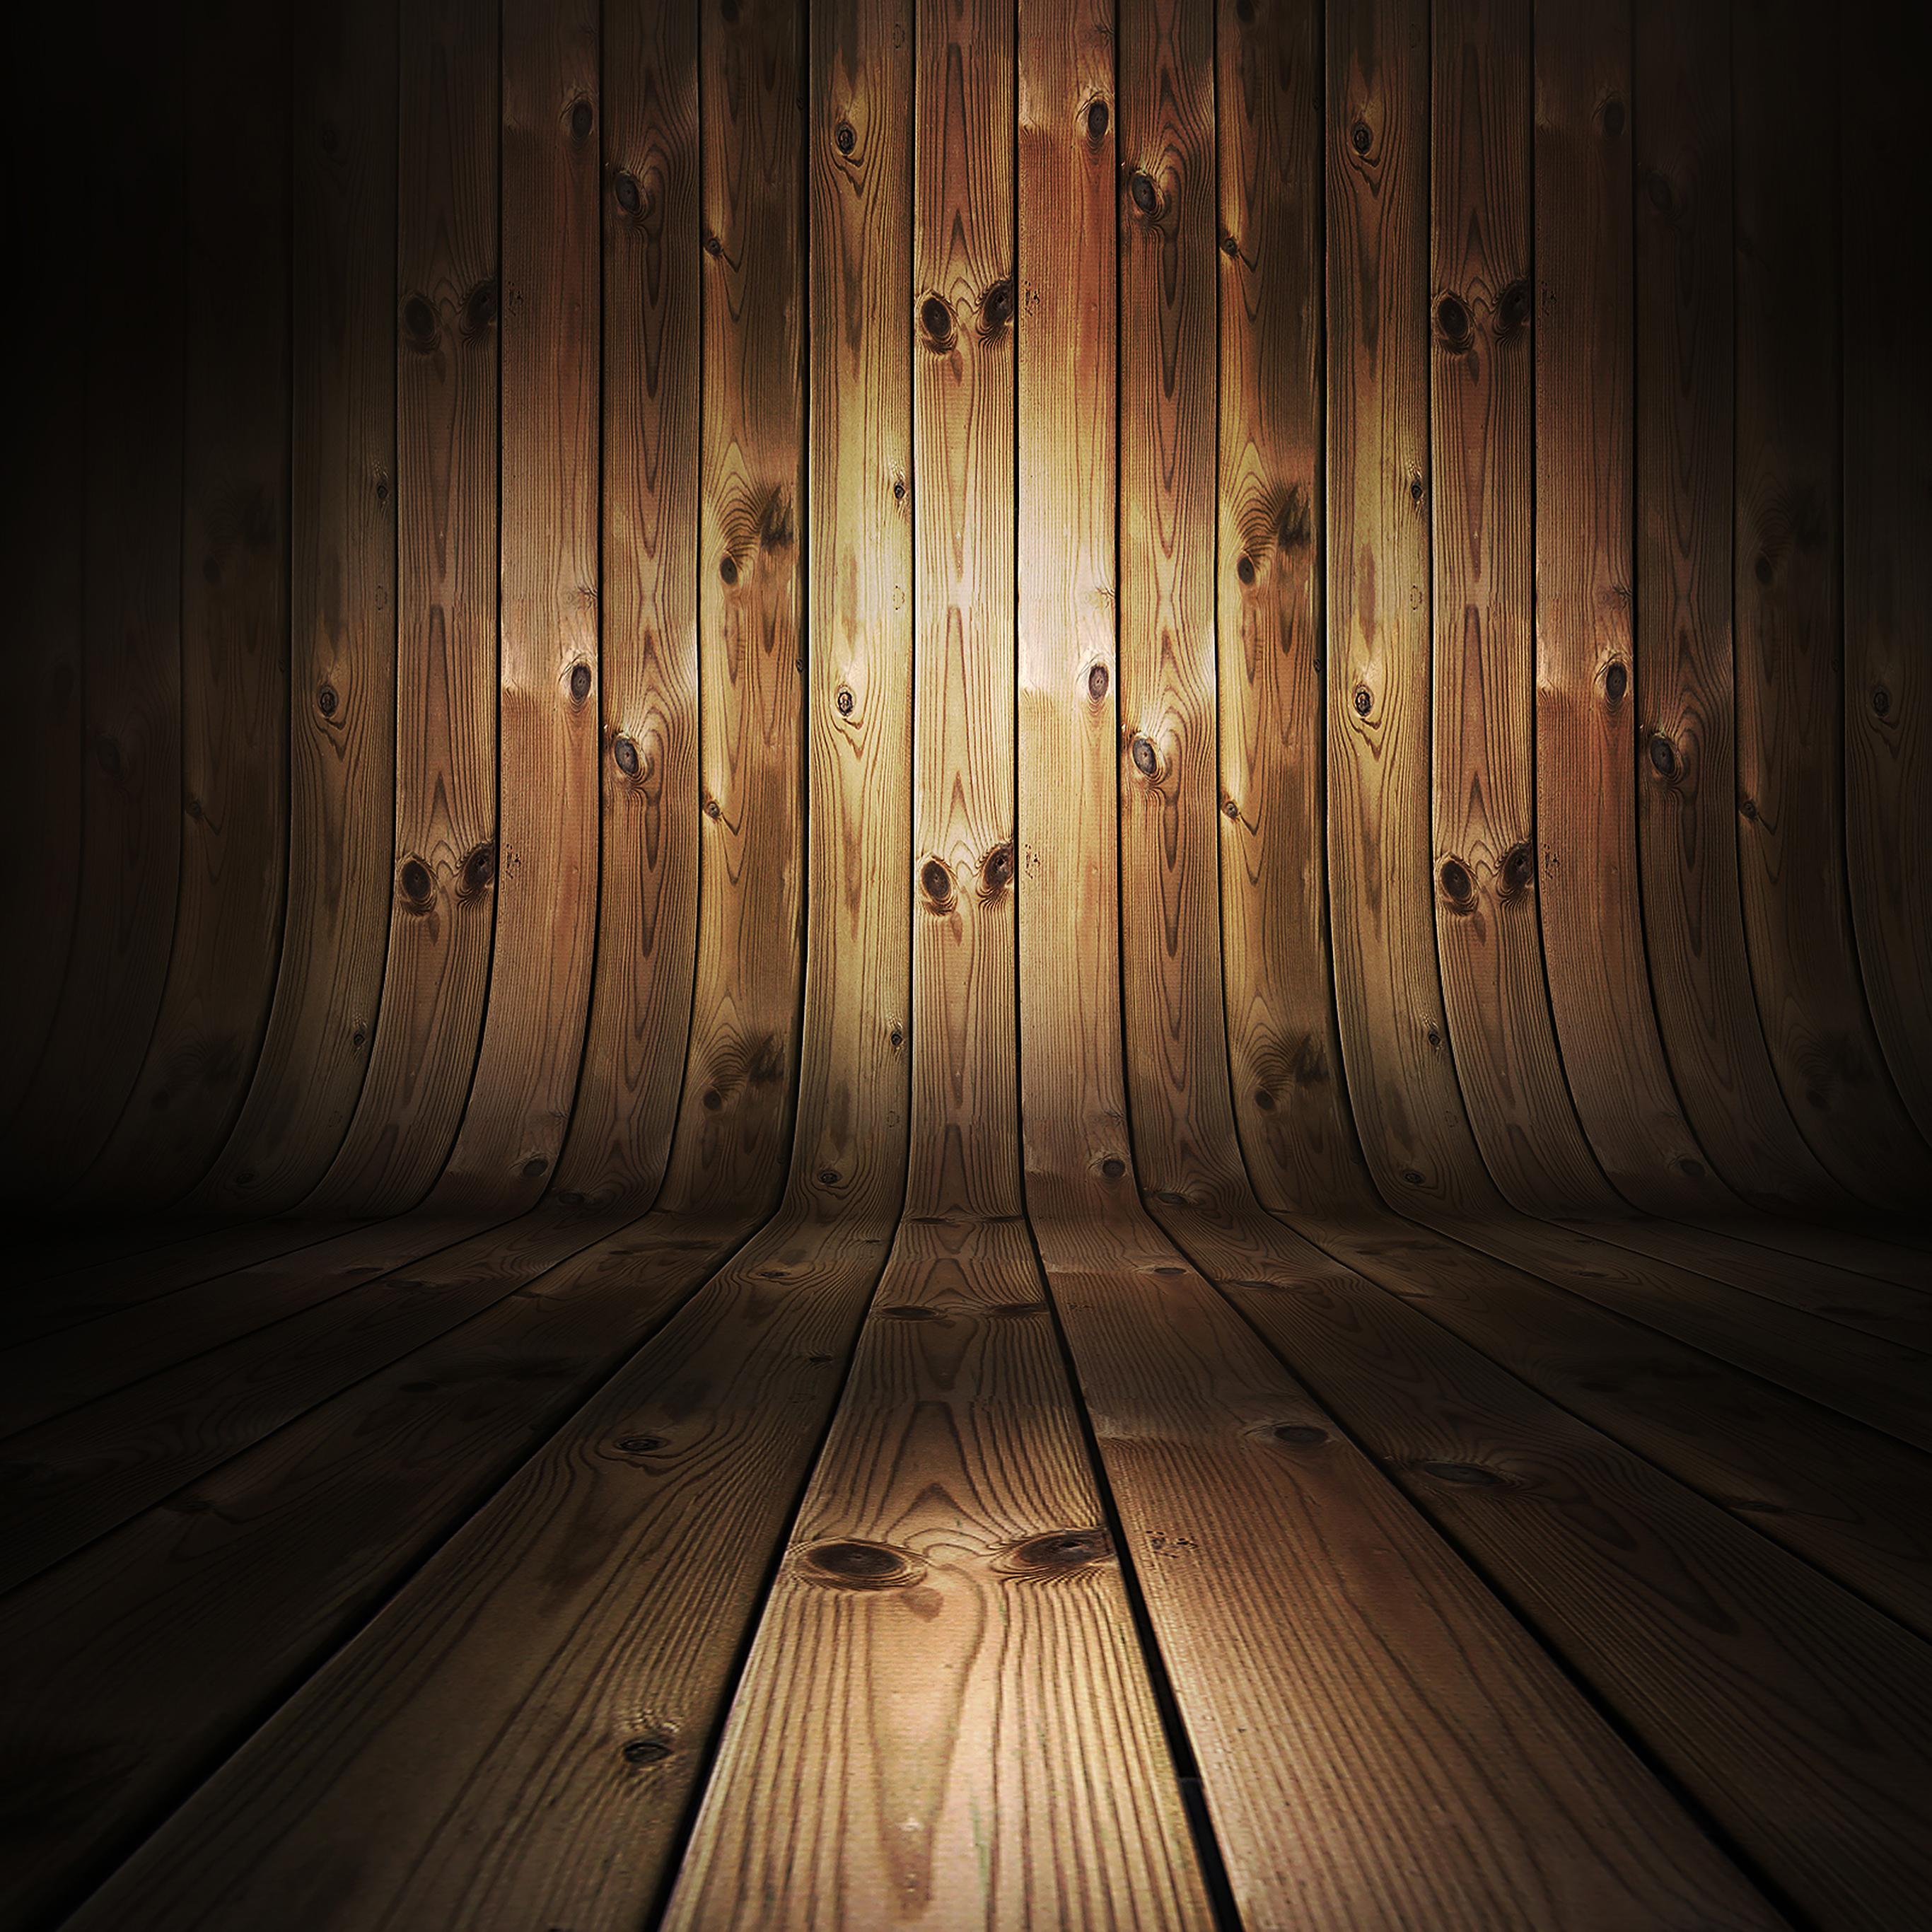 Ae14 dark bent wood background wallpaper - Dark wood wallpaper ...